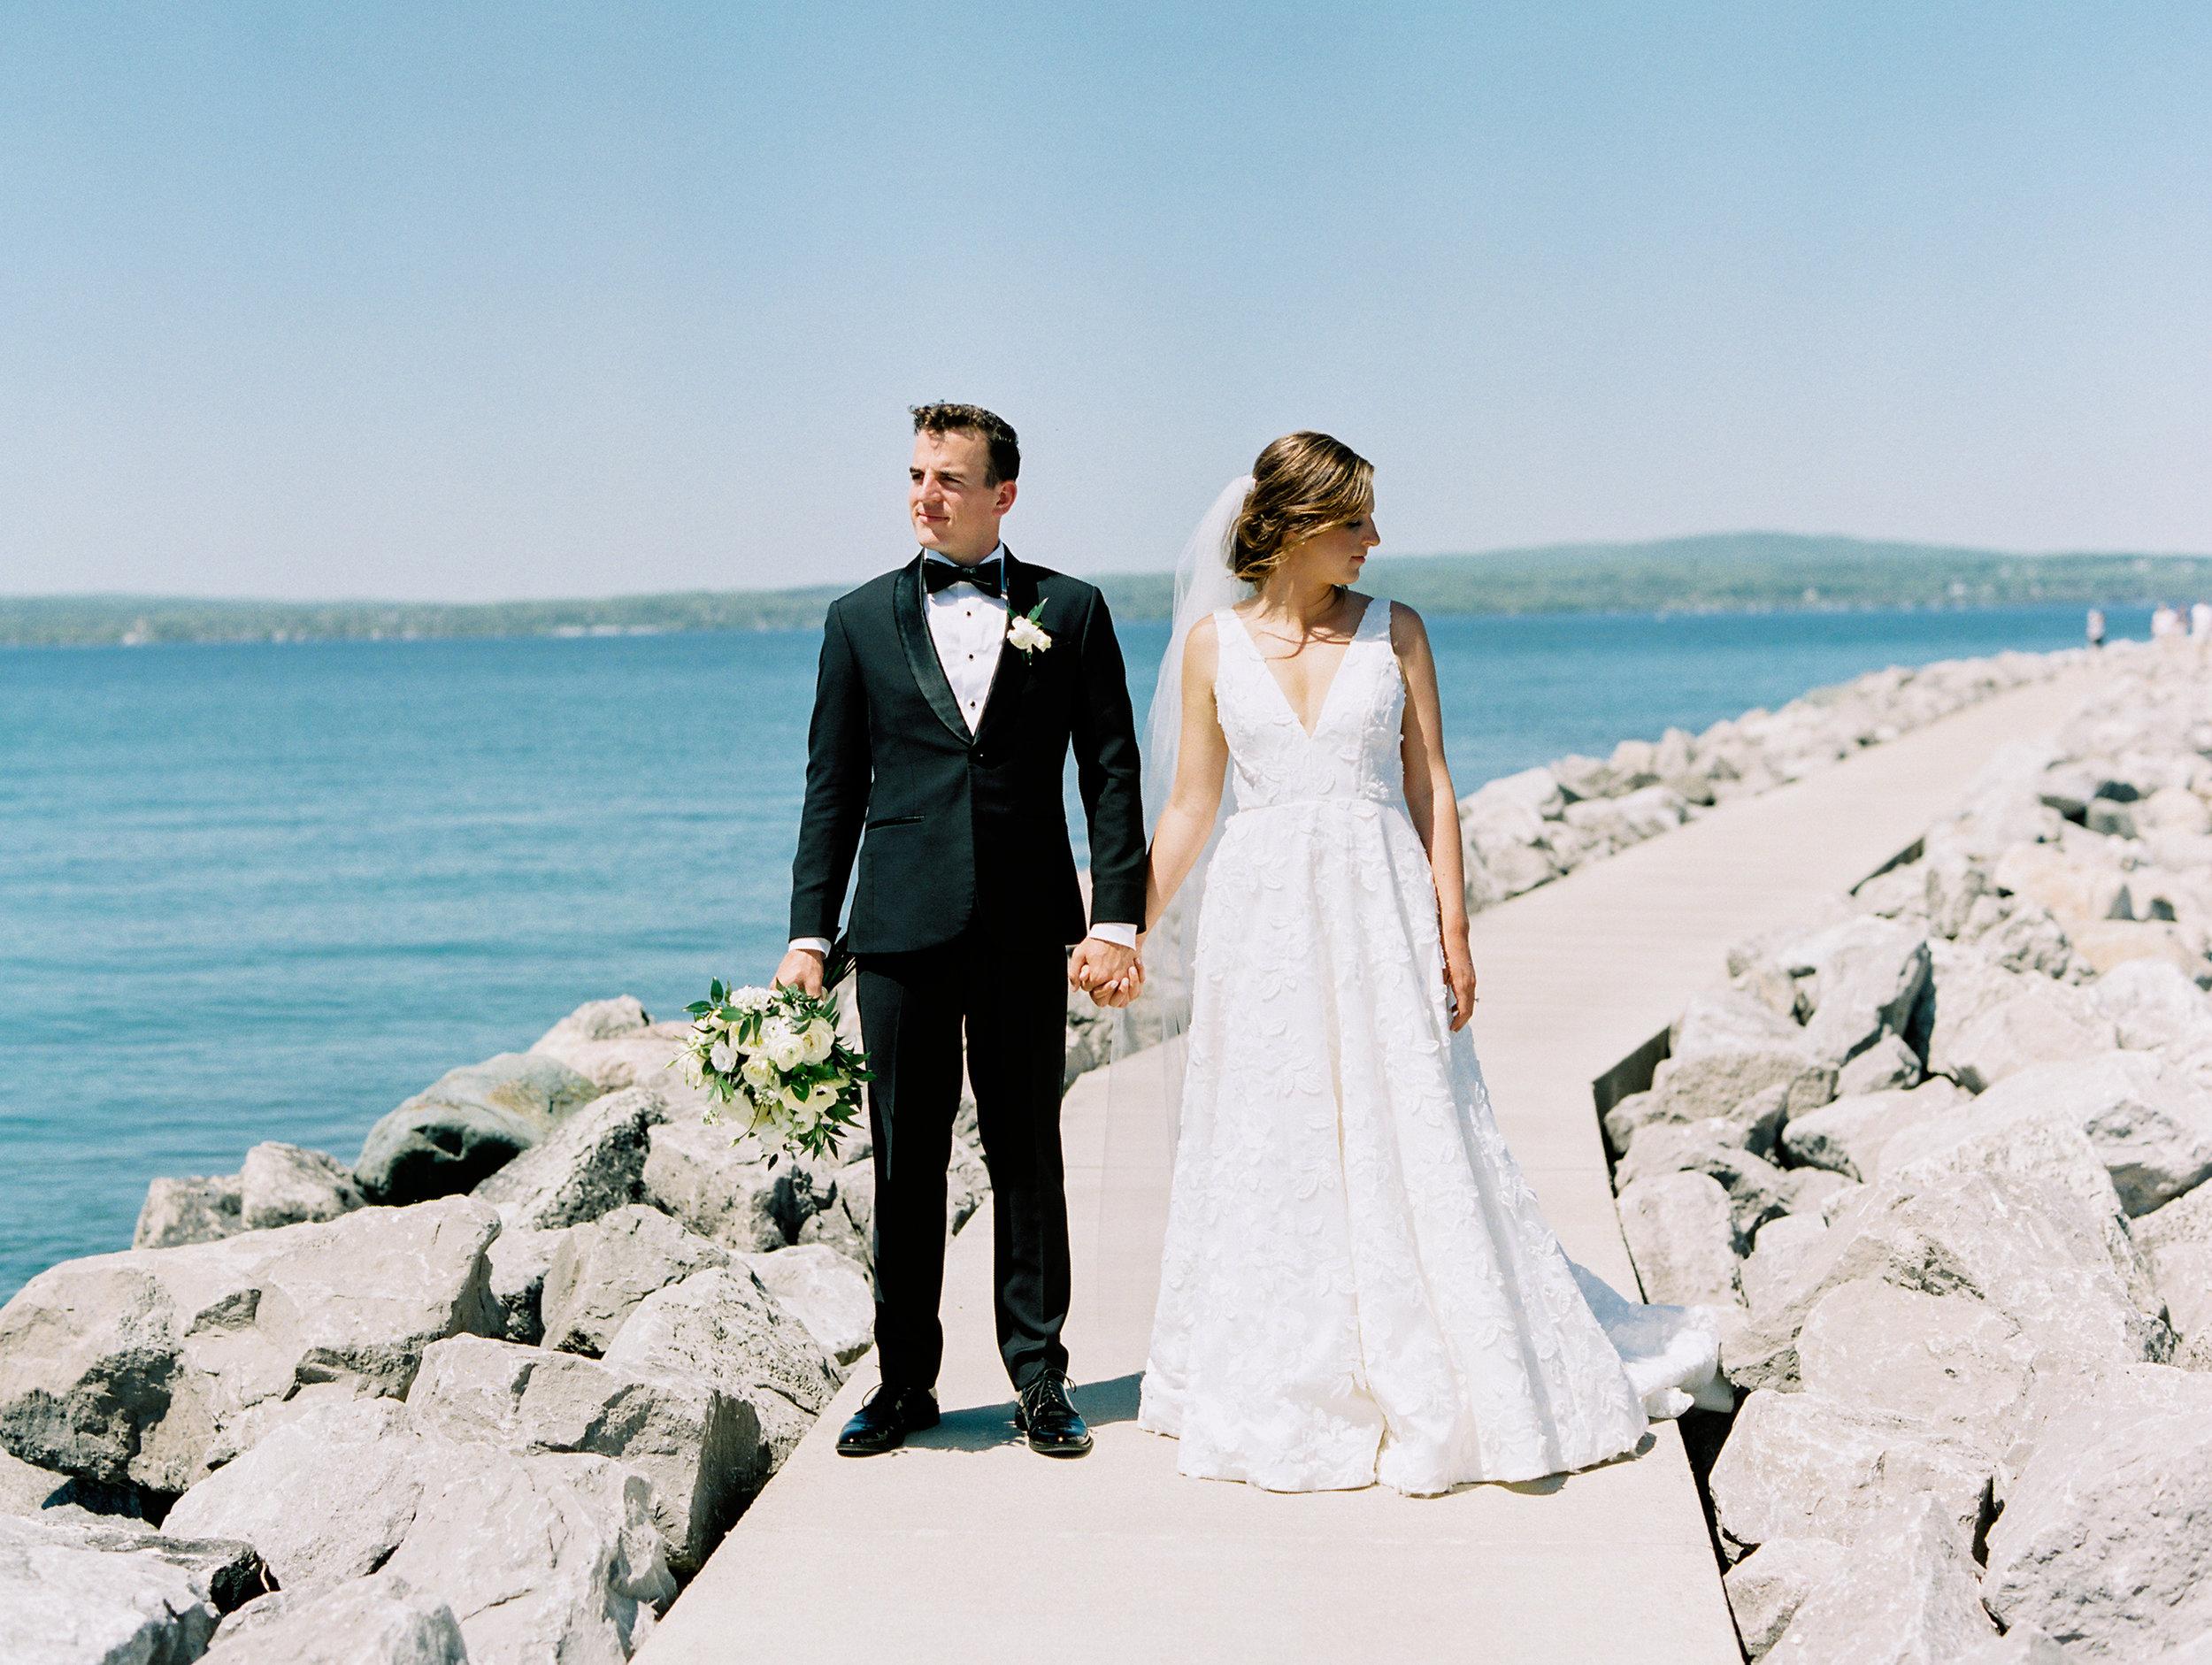 DeGuilio+Wedding+Bridal+Partyf-75.jpg